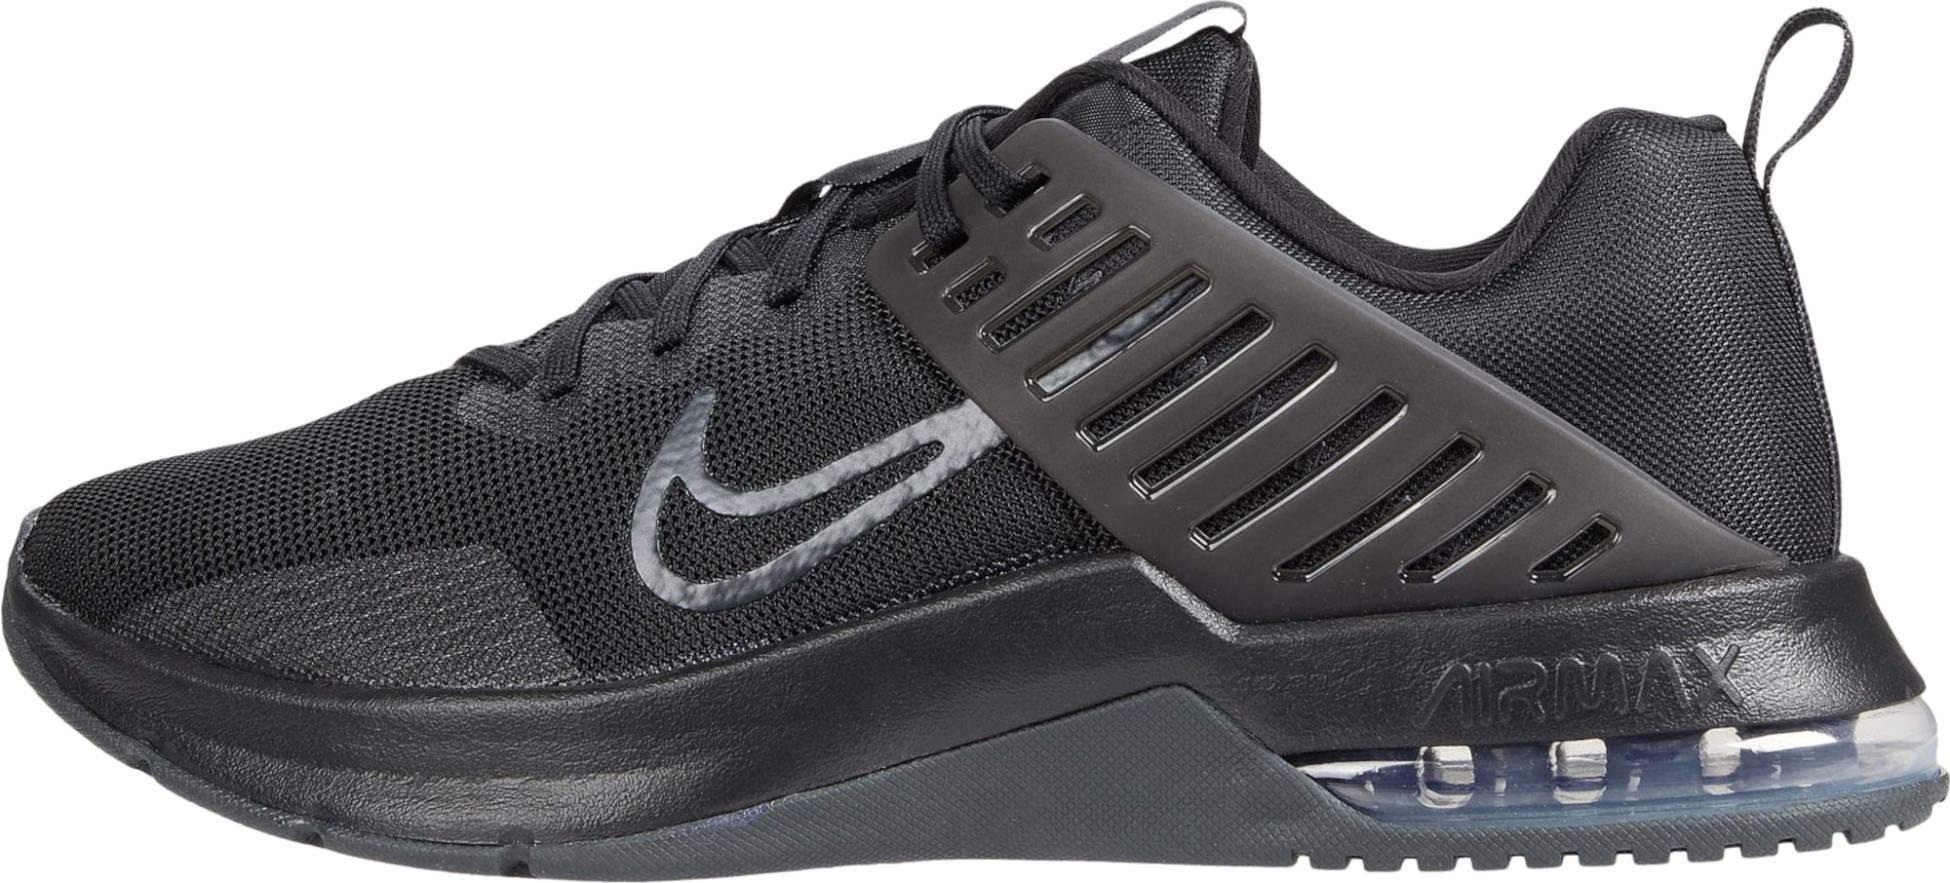 Nike Air Max Alpha TR 3 - Deals ($64), Facts, Reviews (2021 ...